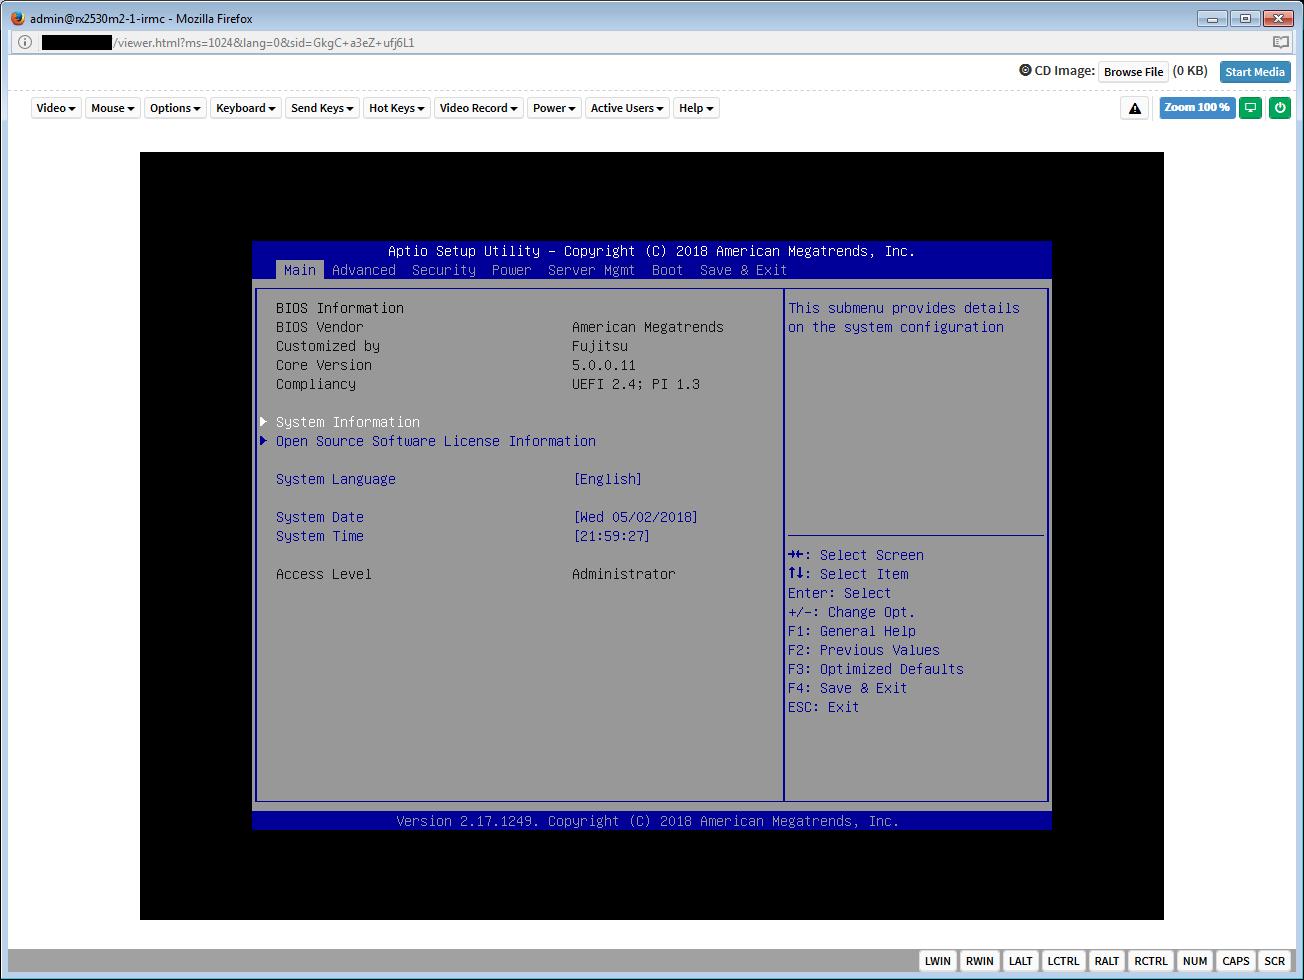 irmc s4 license key download